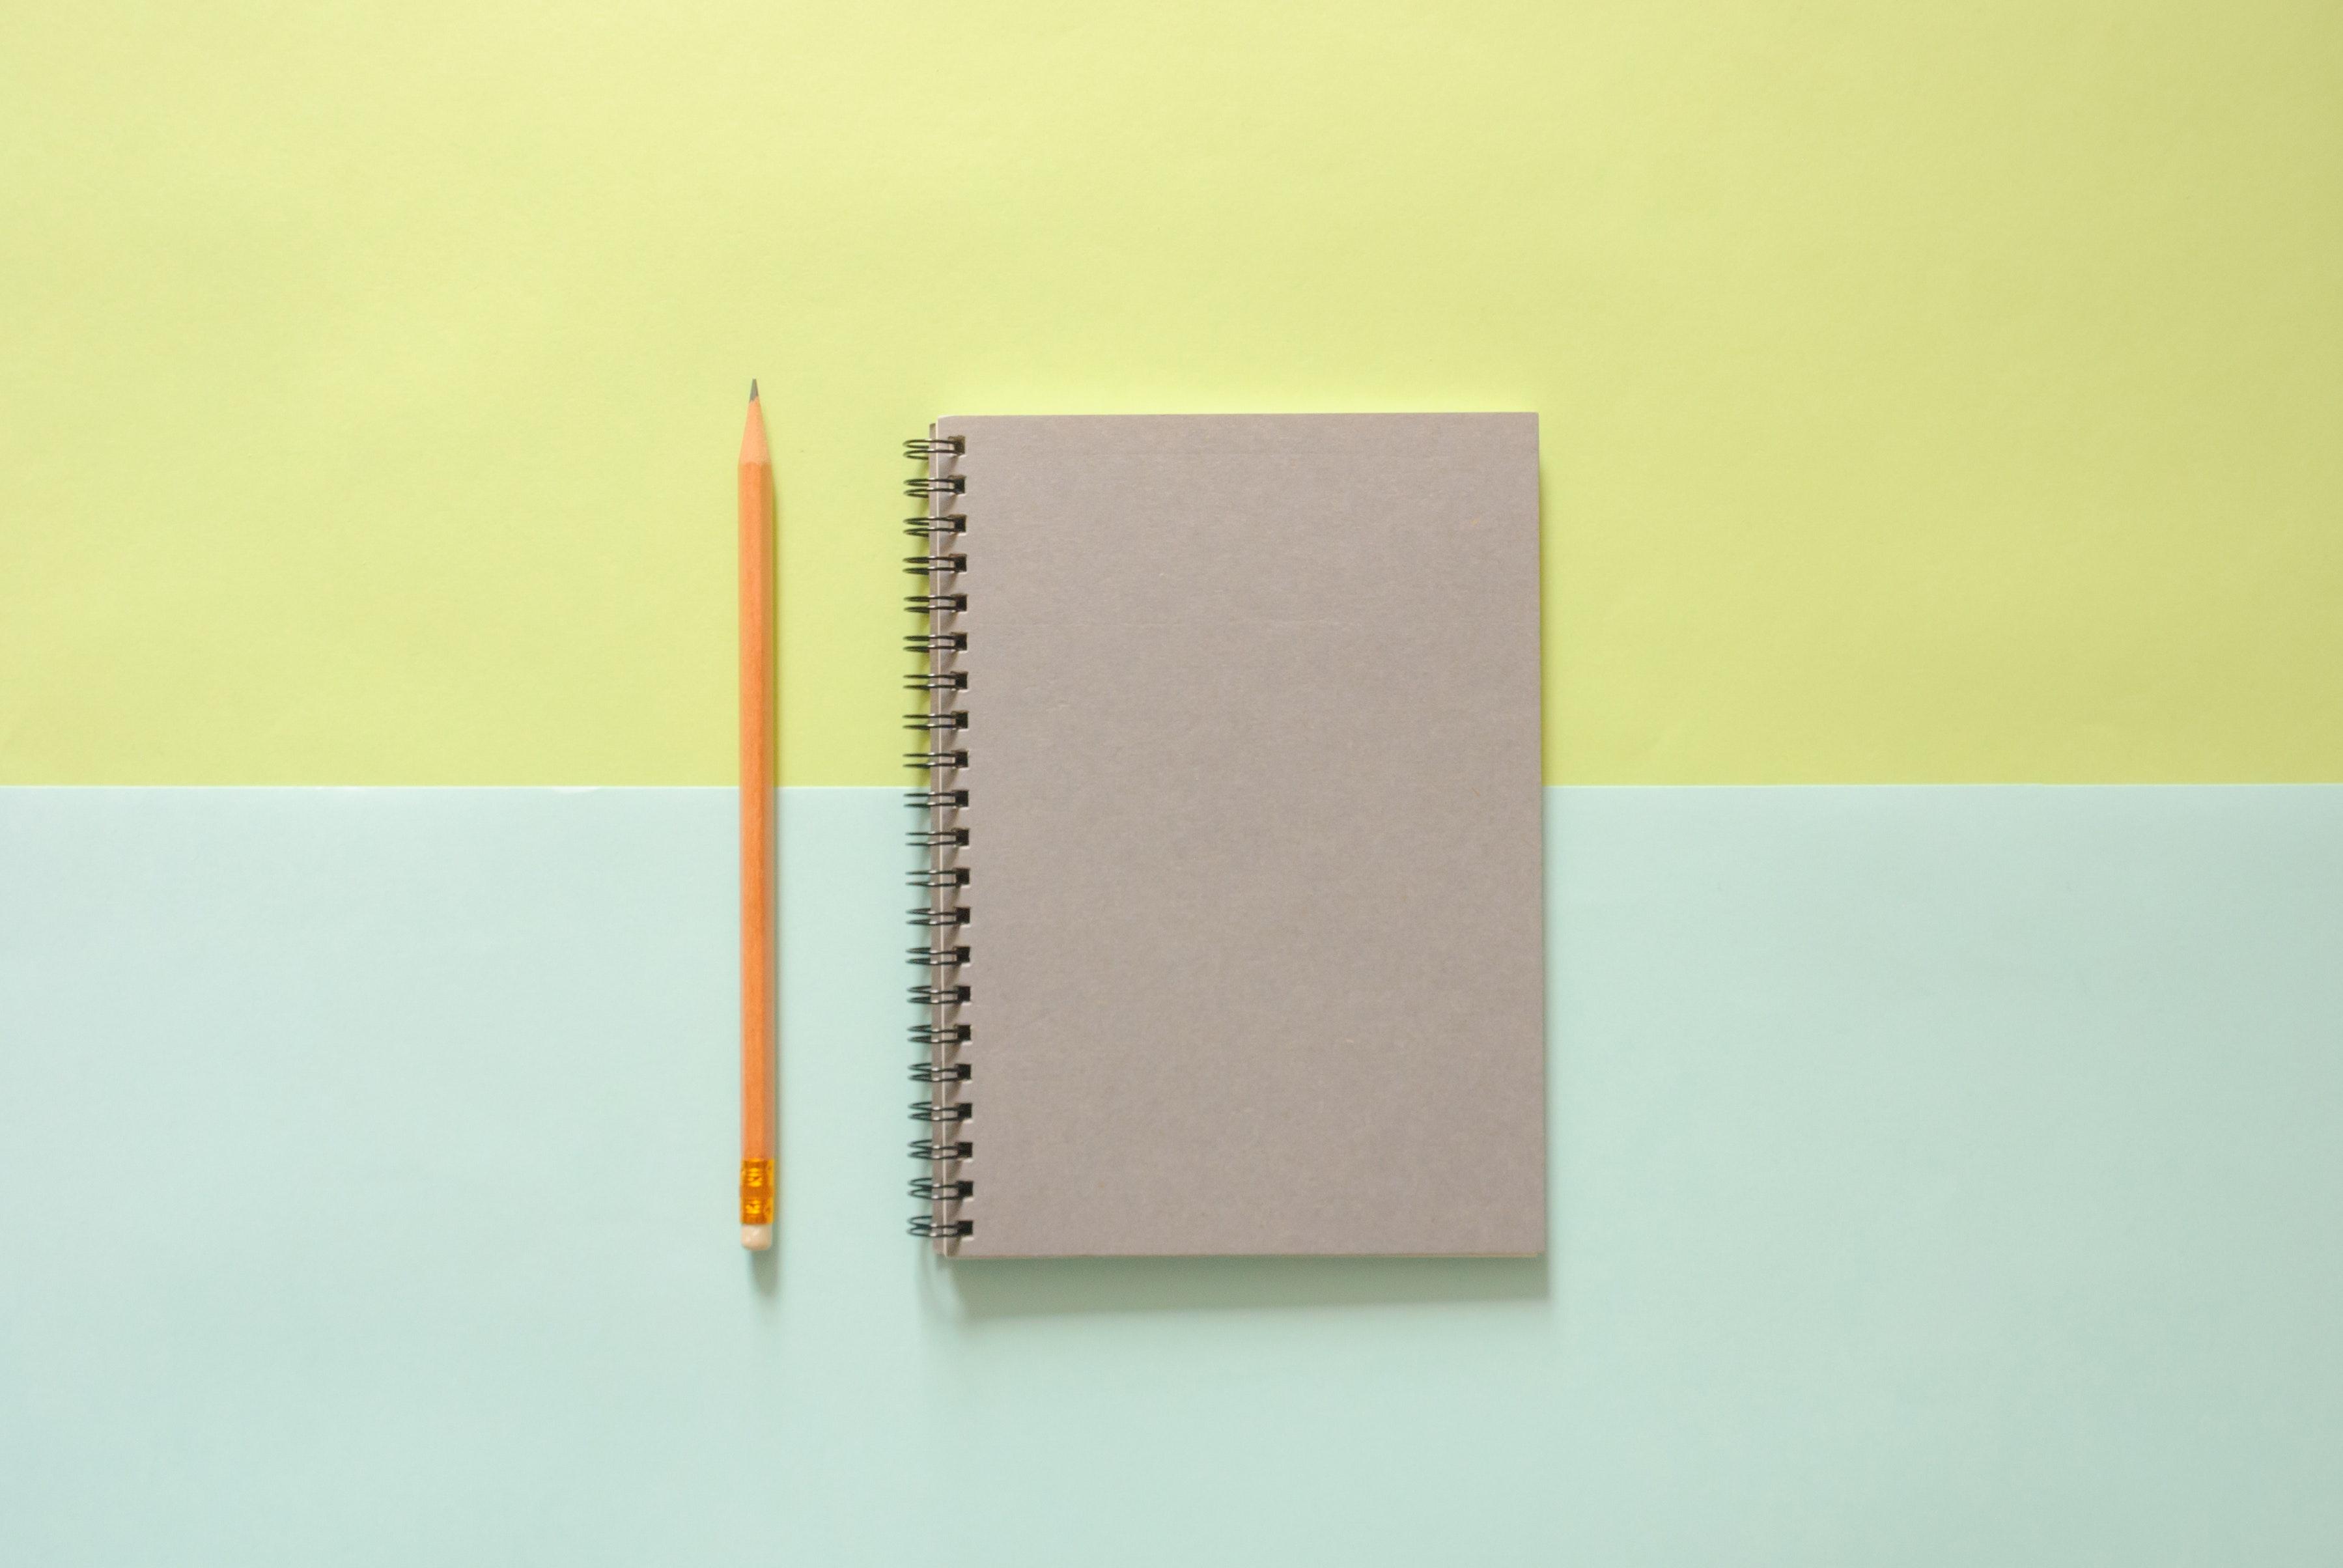 background-notebook-pencil-school-supplies-544115